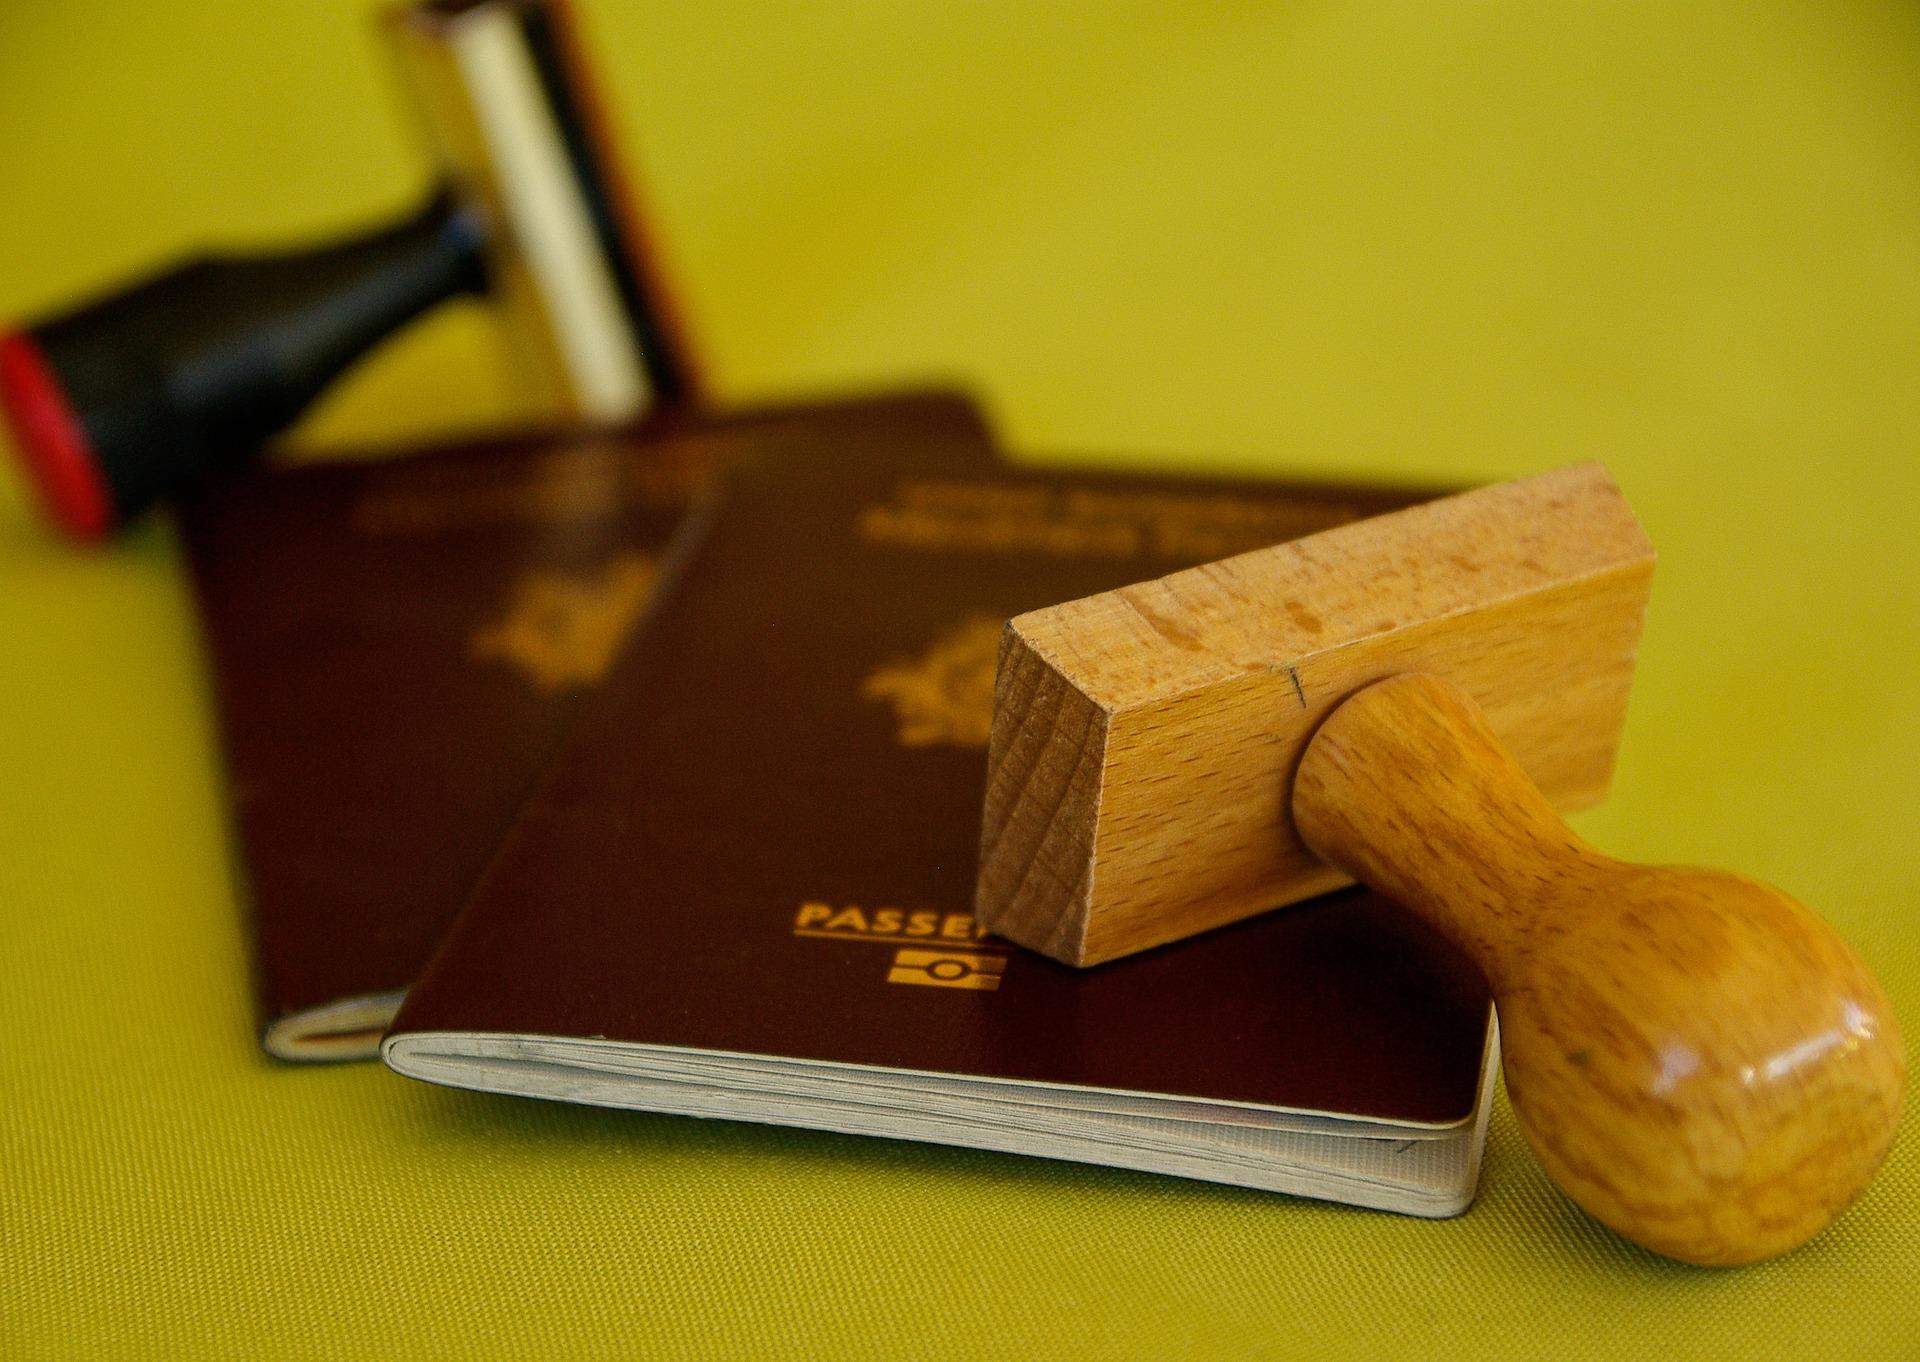 passeport-studying-france